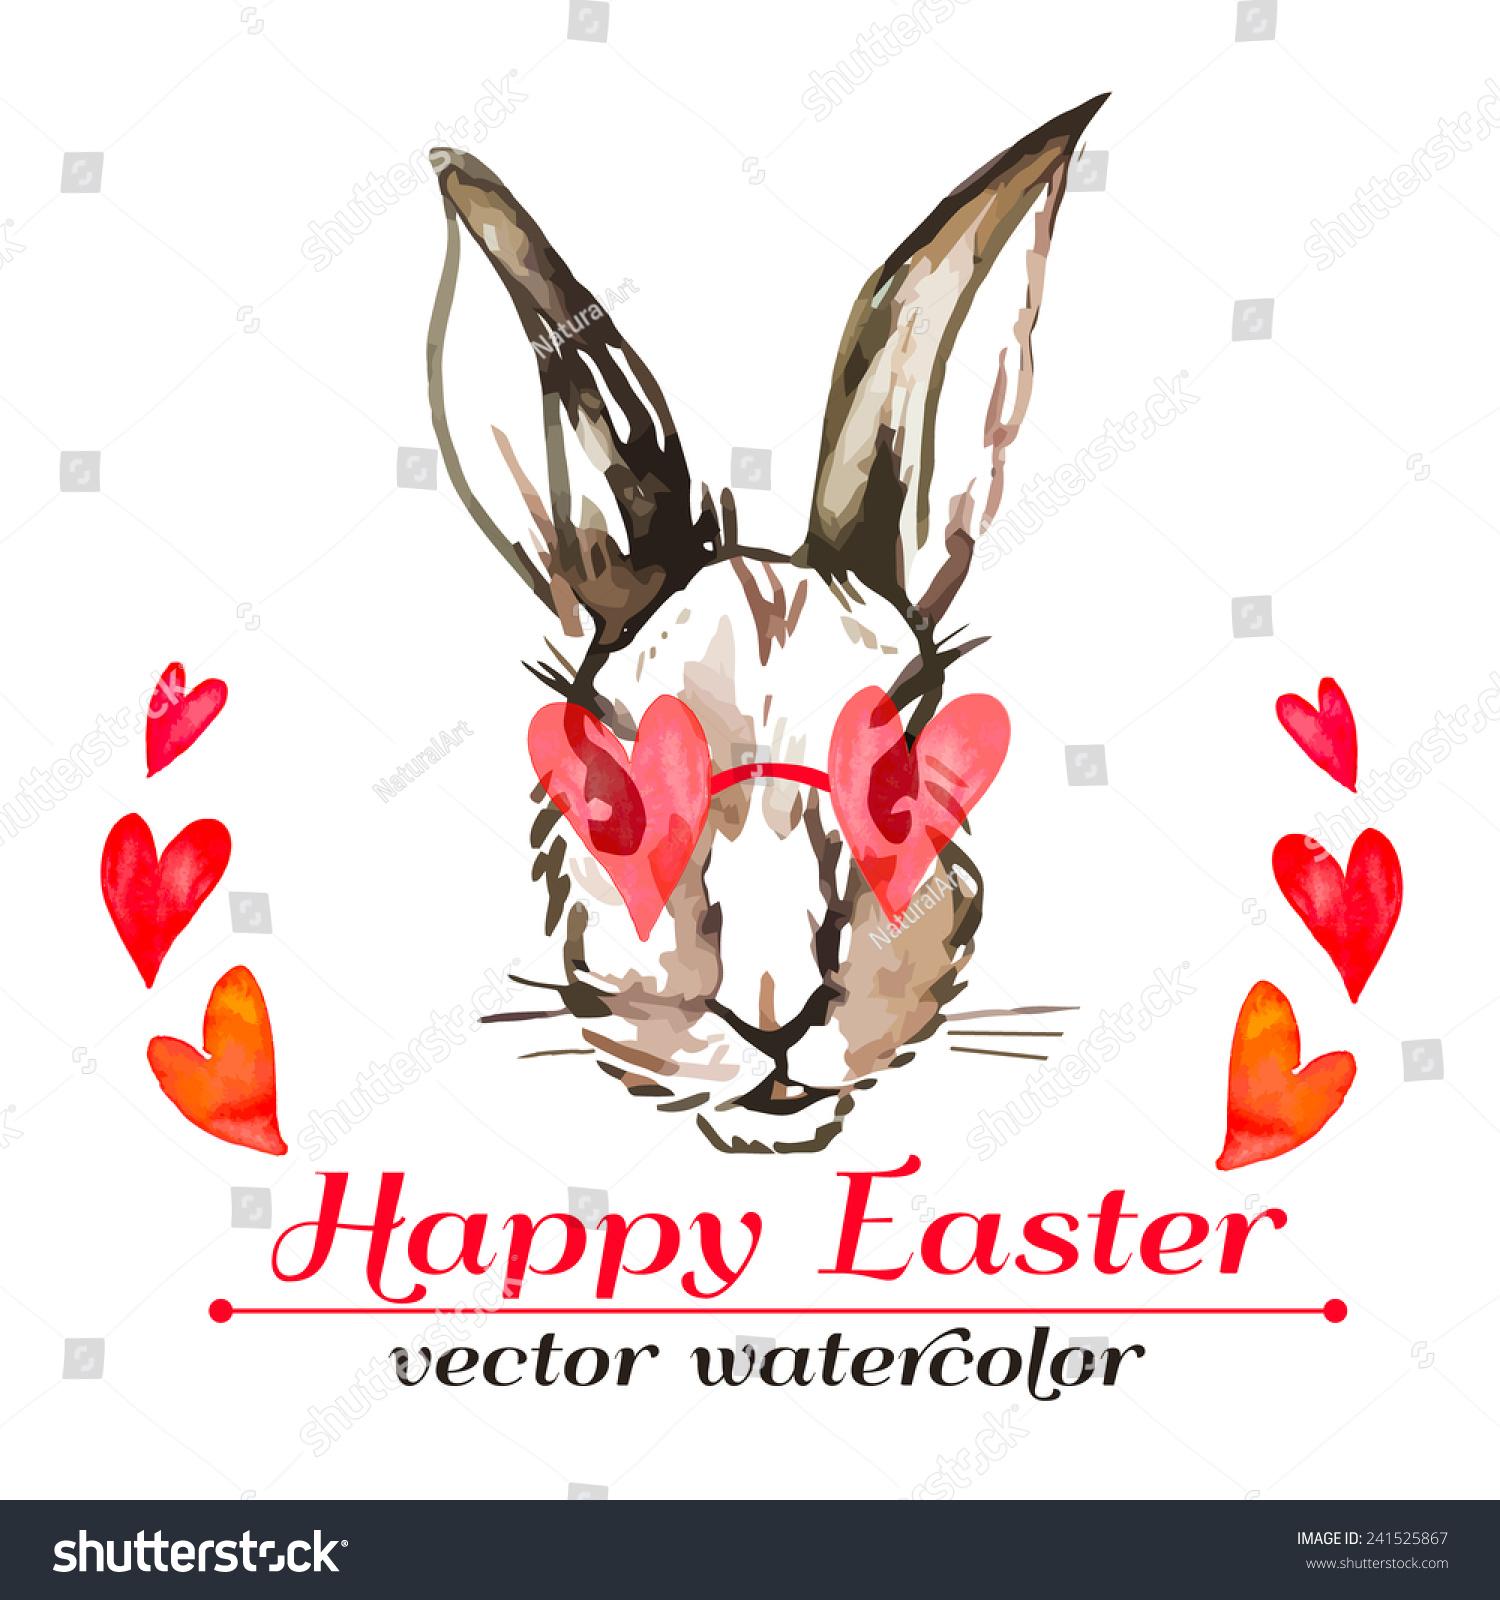 Easter Bunny Hipster Watercolor Vector Happy Stock Vector ...